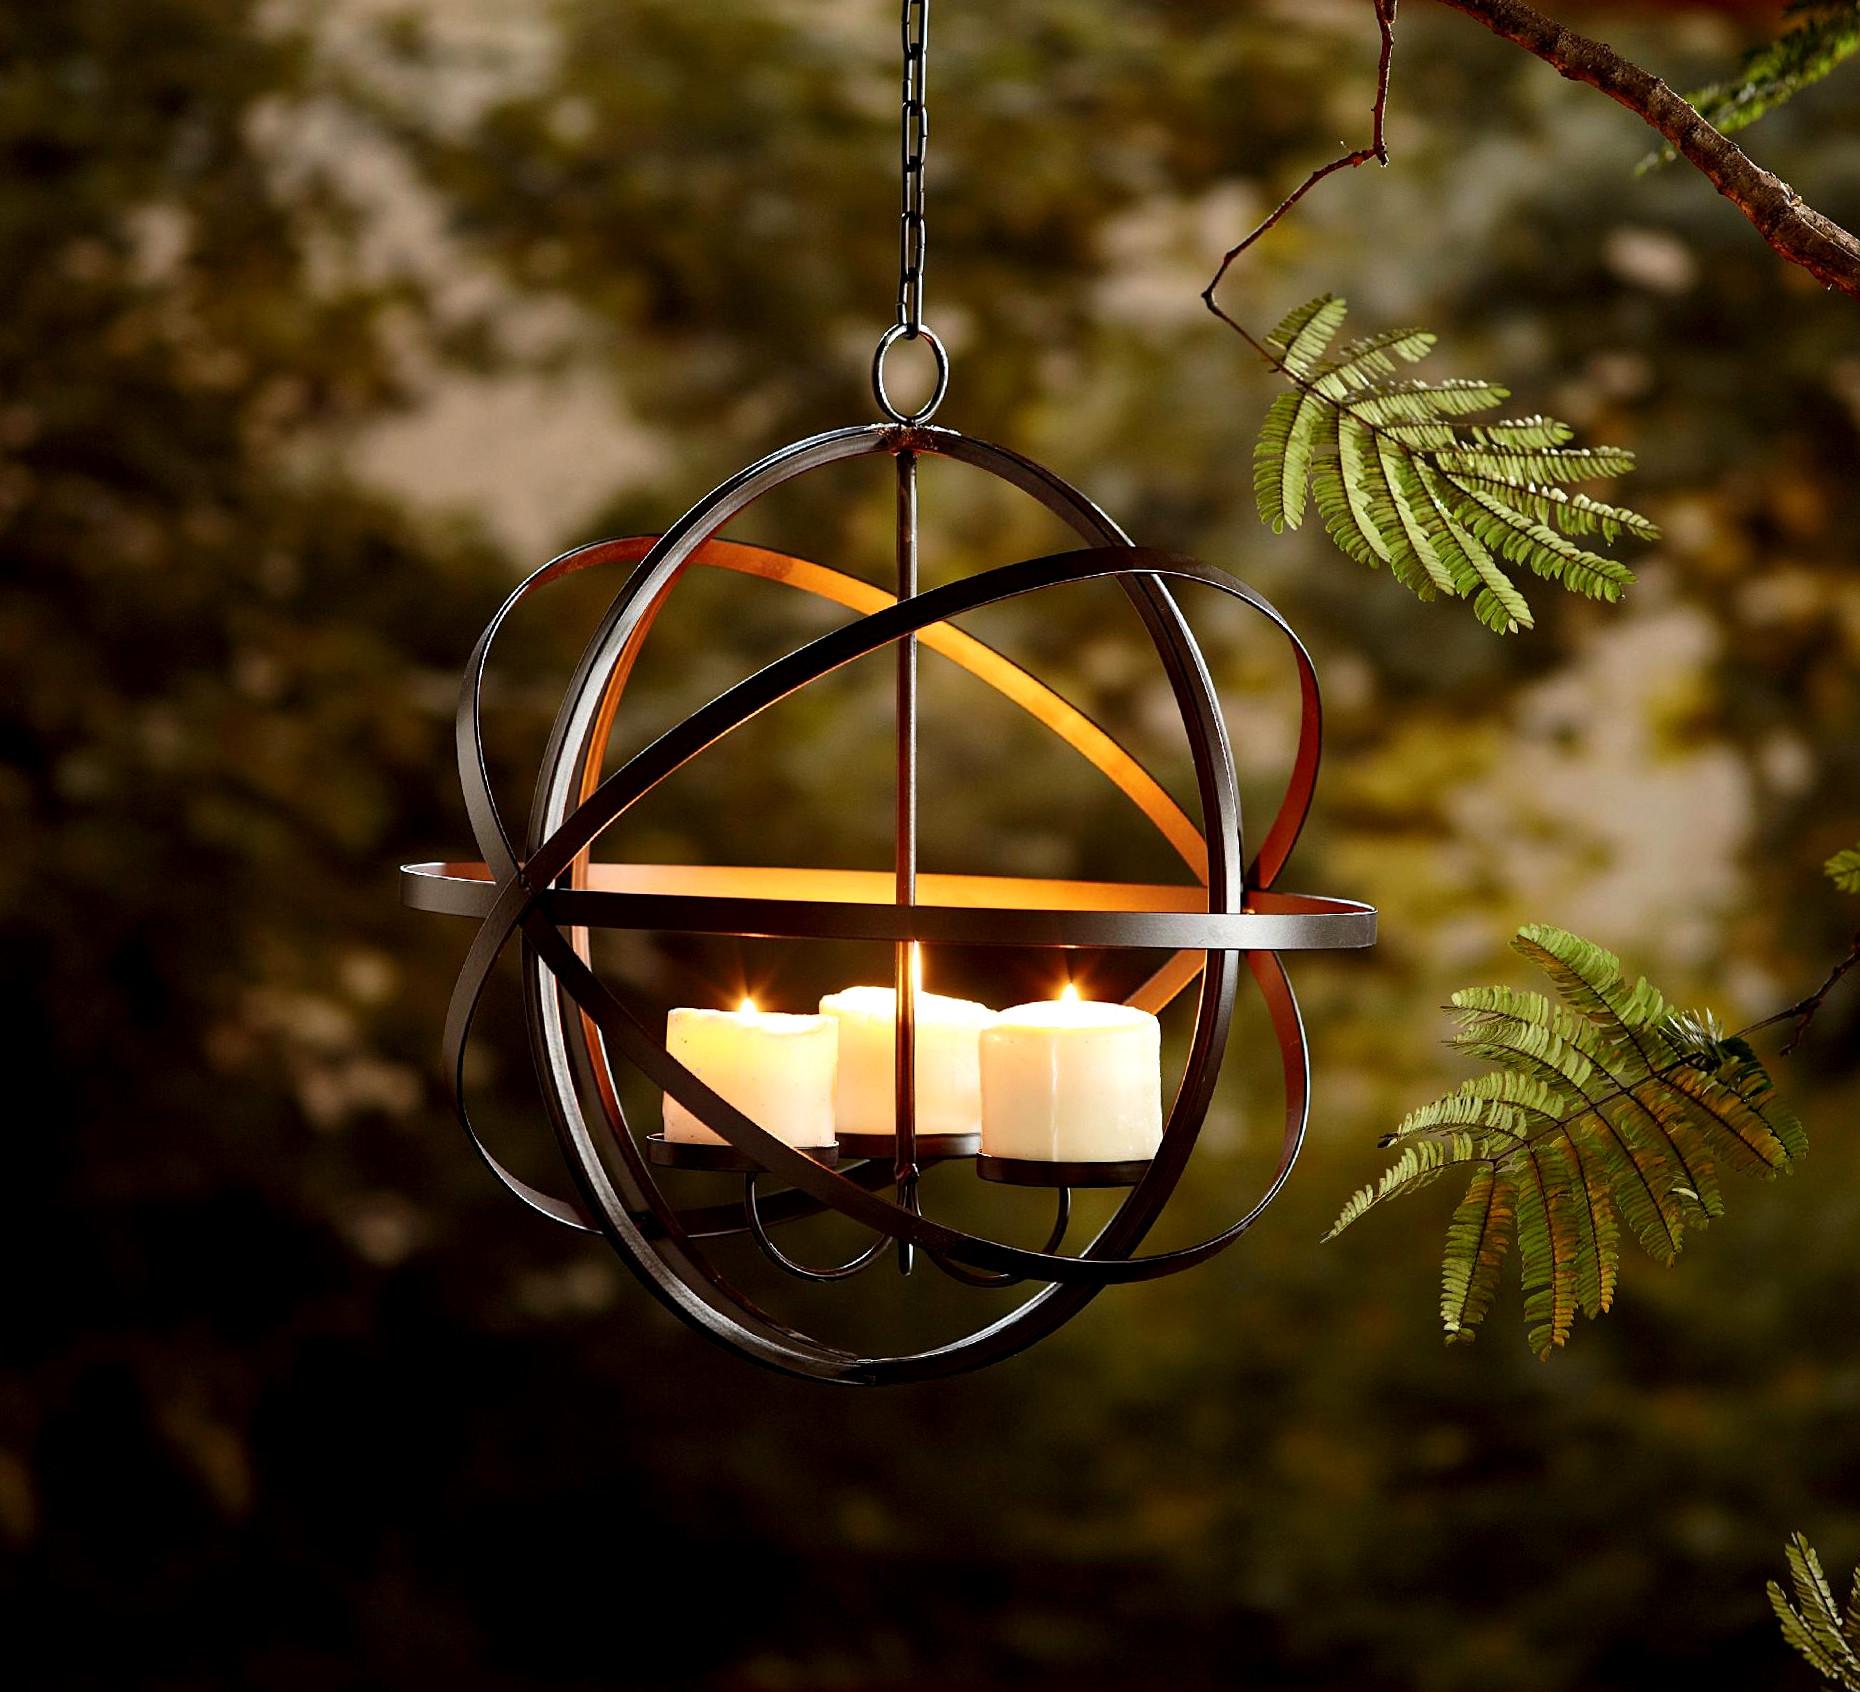 Garden Lights: The Secret To Fabulous Outdoor Living - TCL ...